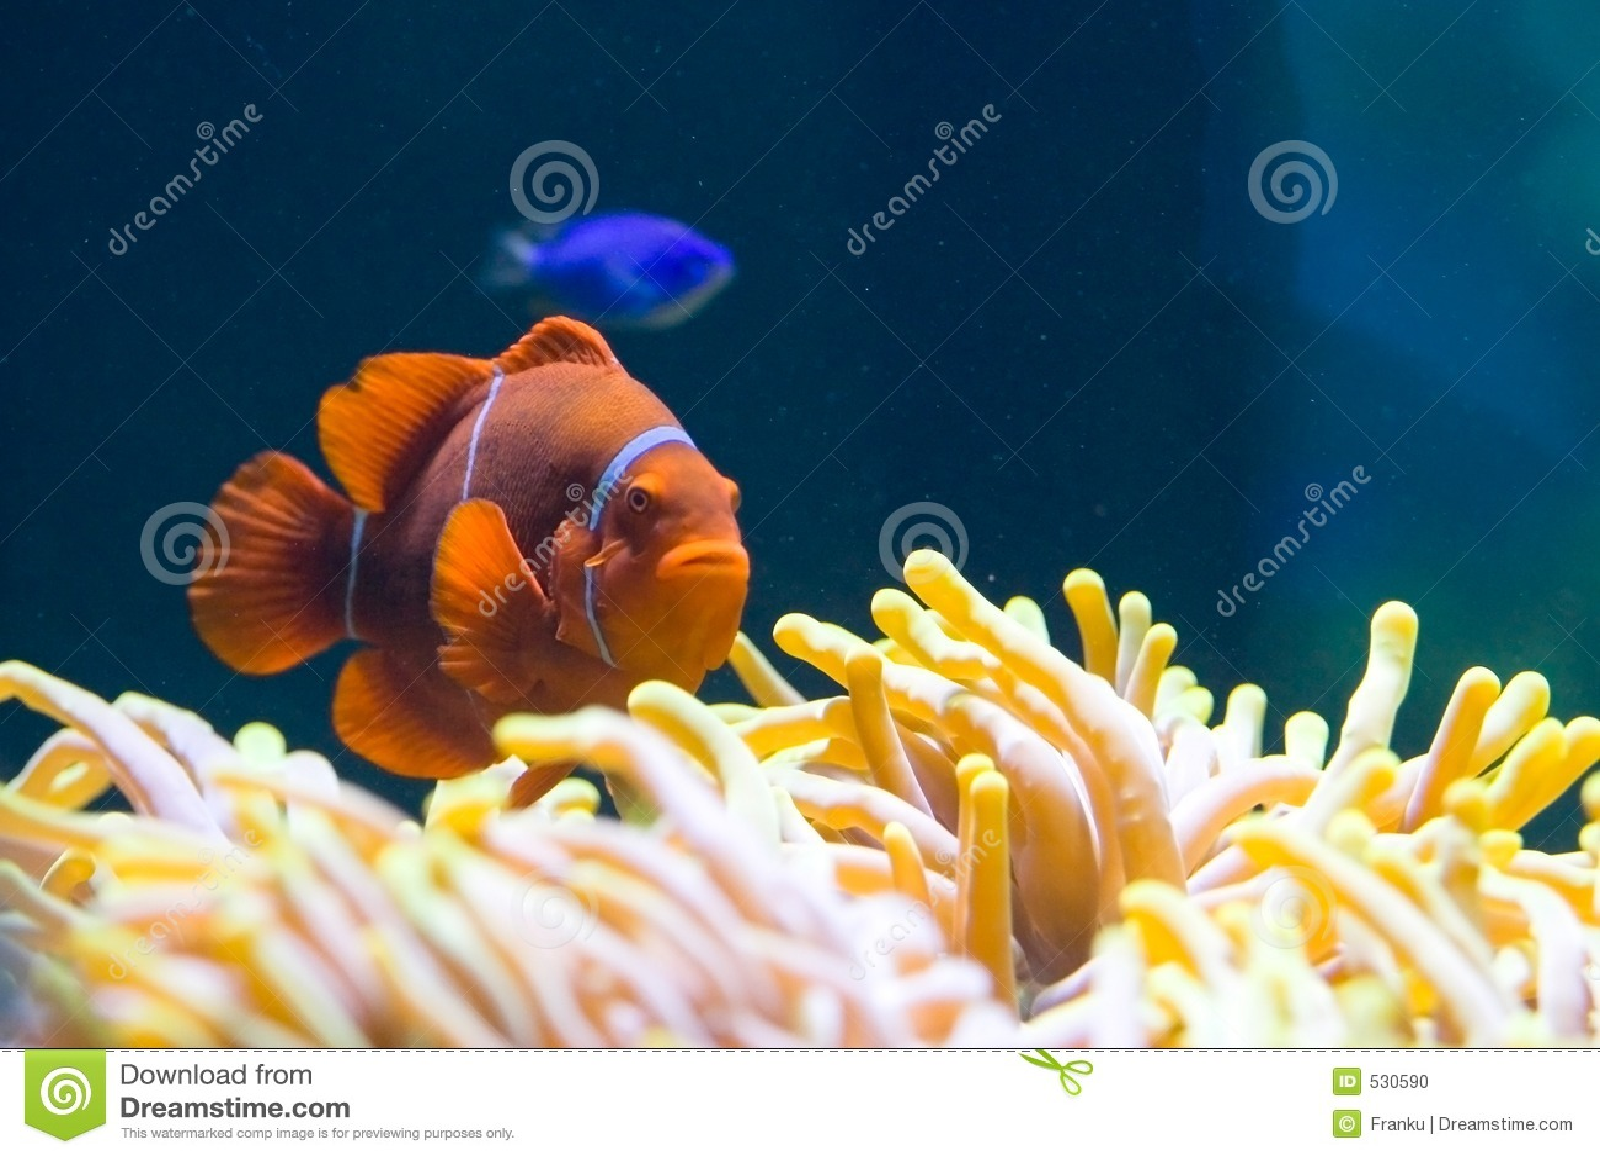 Download 银莲花属clownfish 库存照片. 图片 包括有 热带, 坦克, 礁石, 镶边, 共生, 本质, 空白, 五颜六色 - 530590